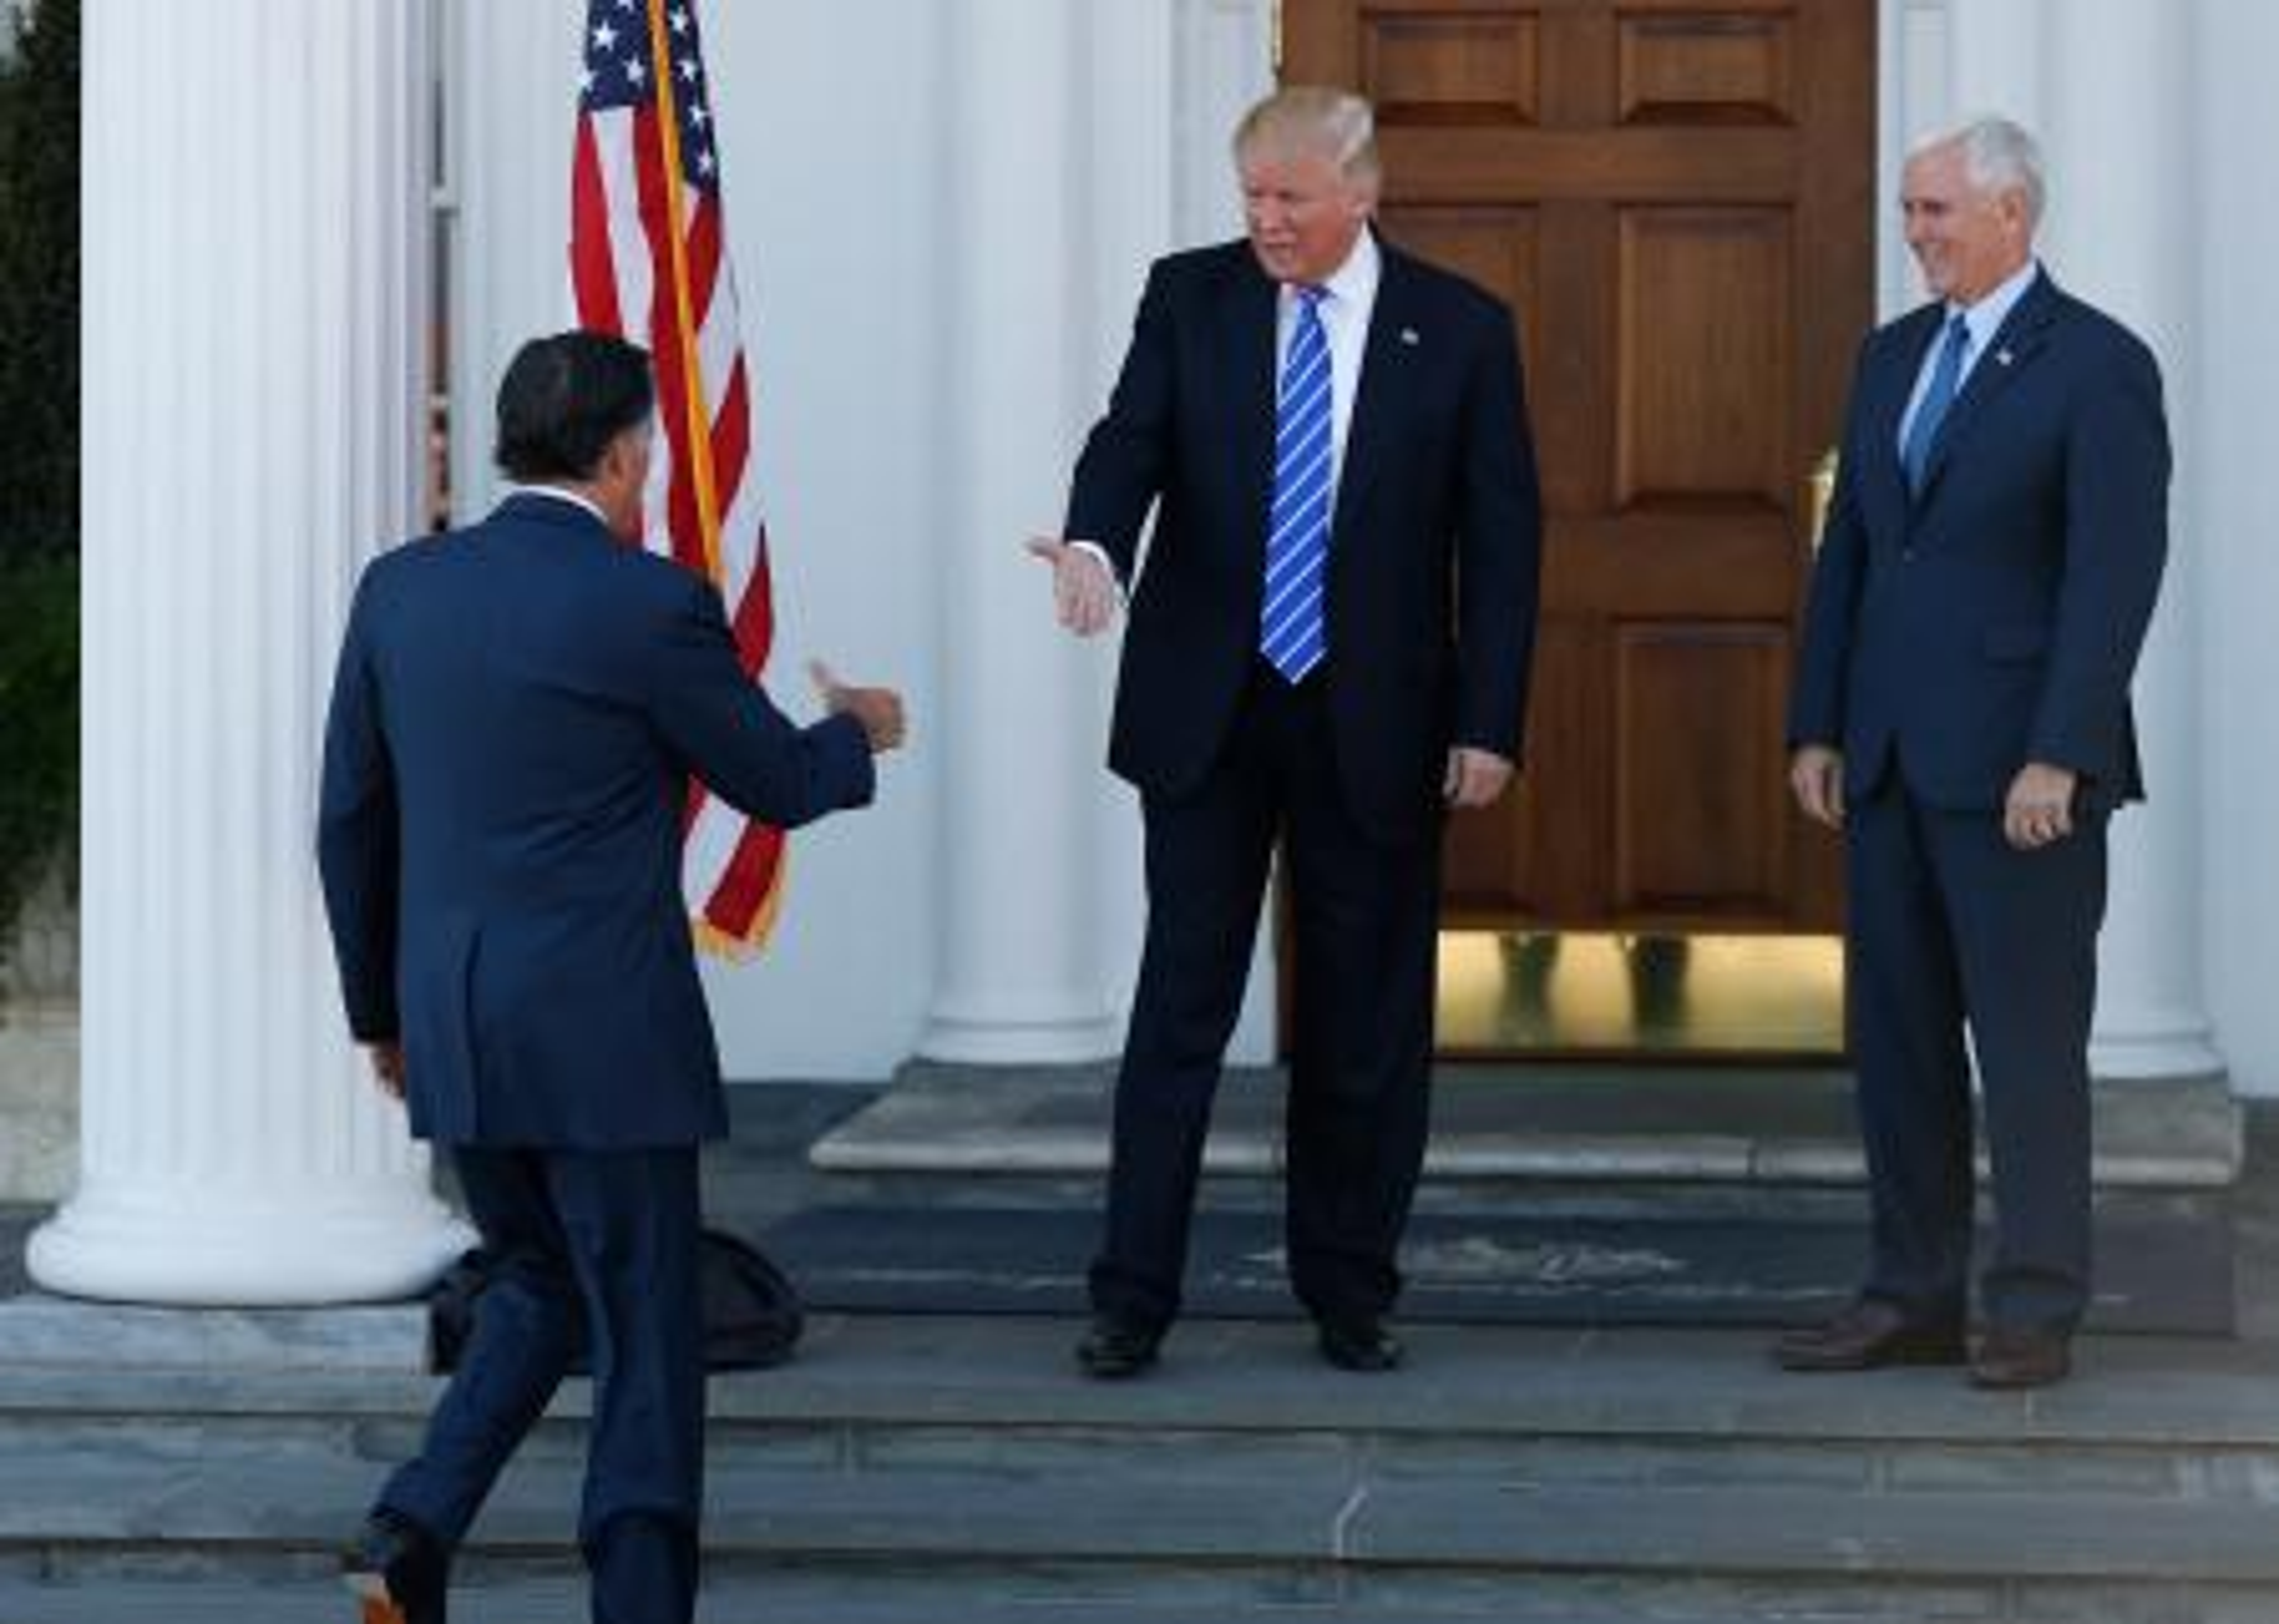 Donald Trump, Mike Pence, Mitt Romney